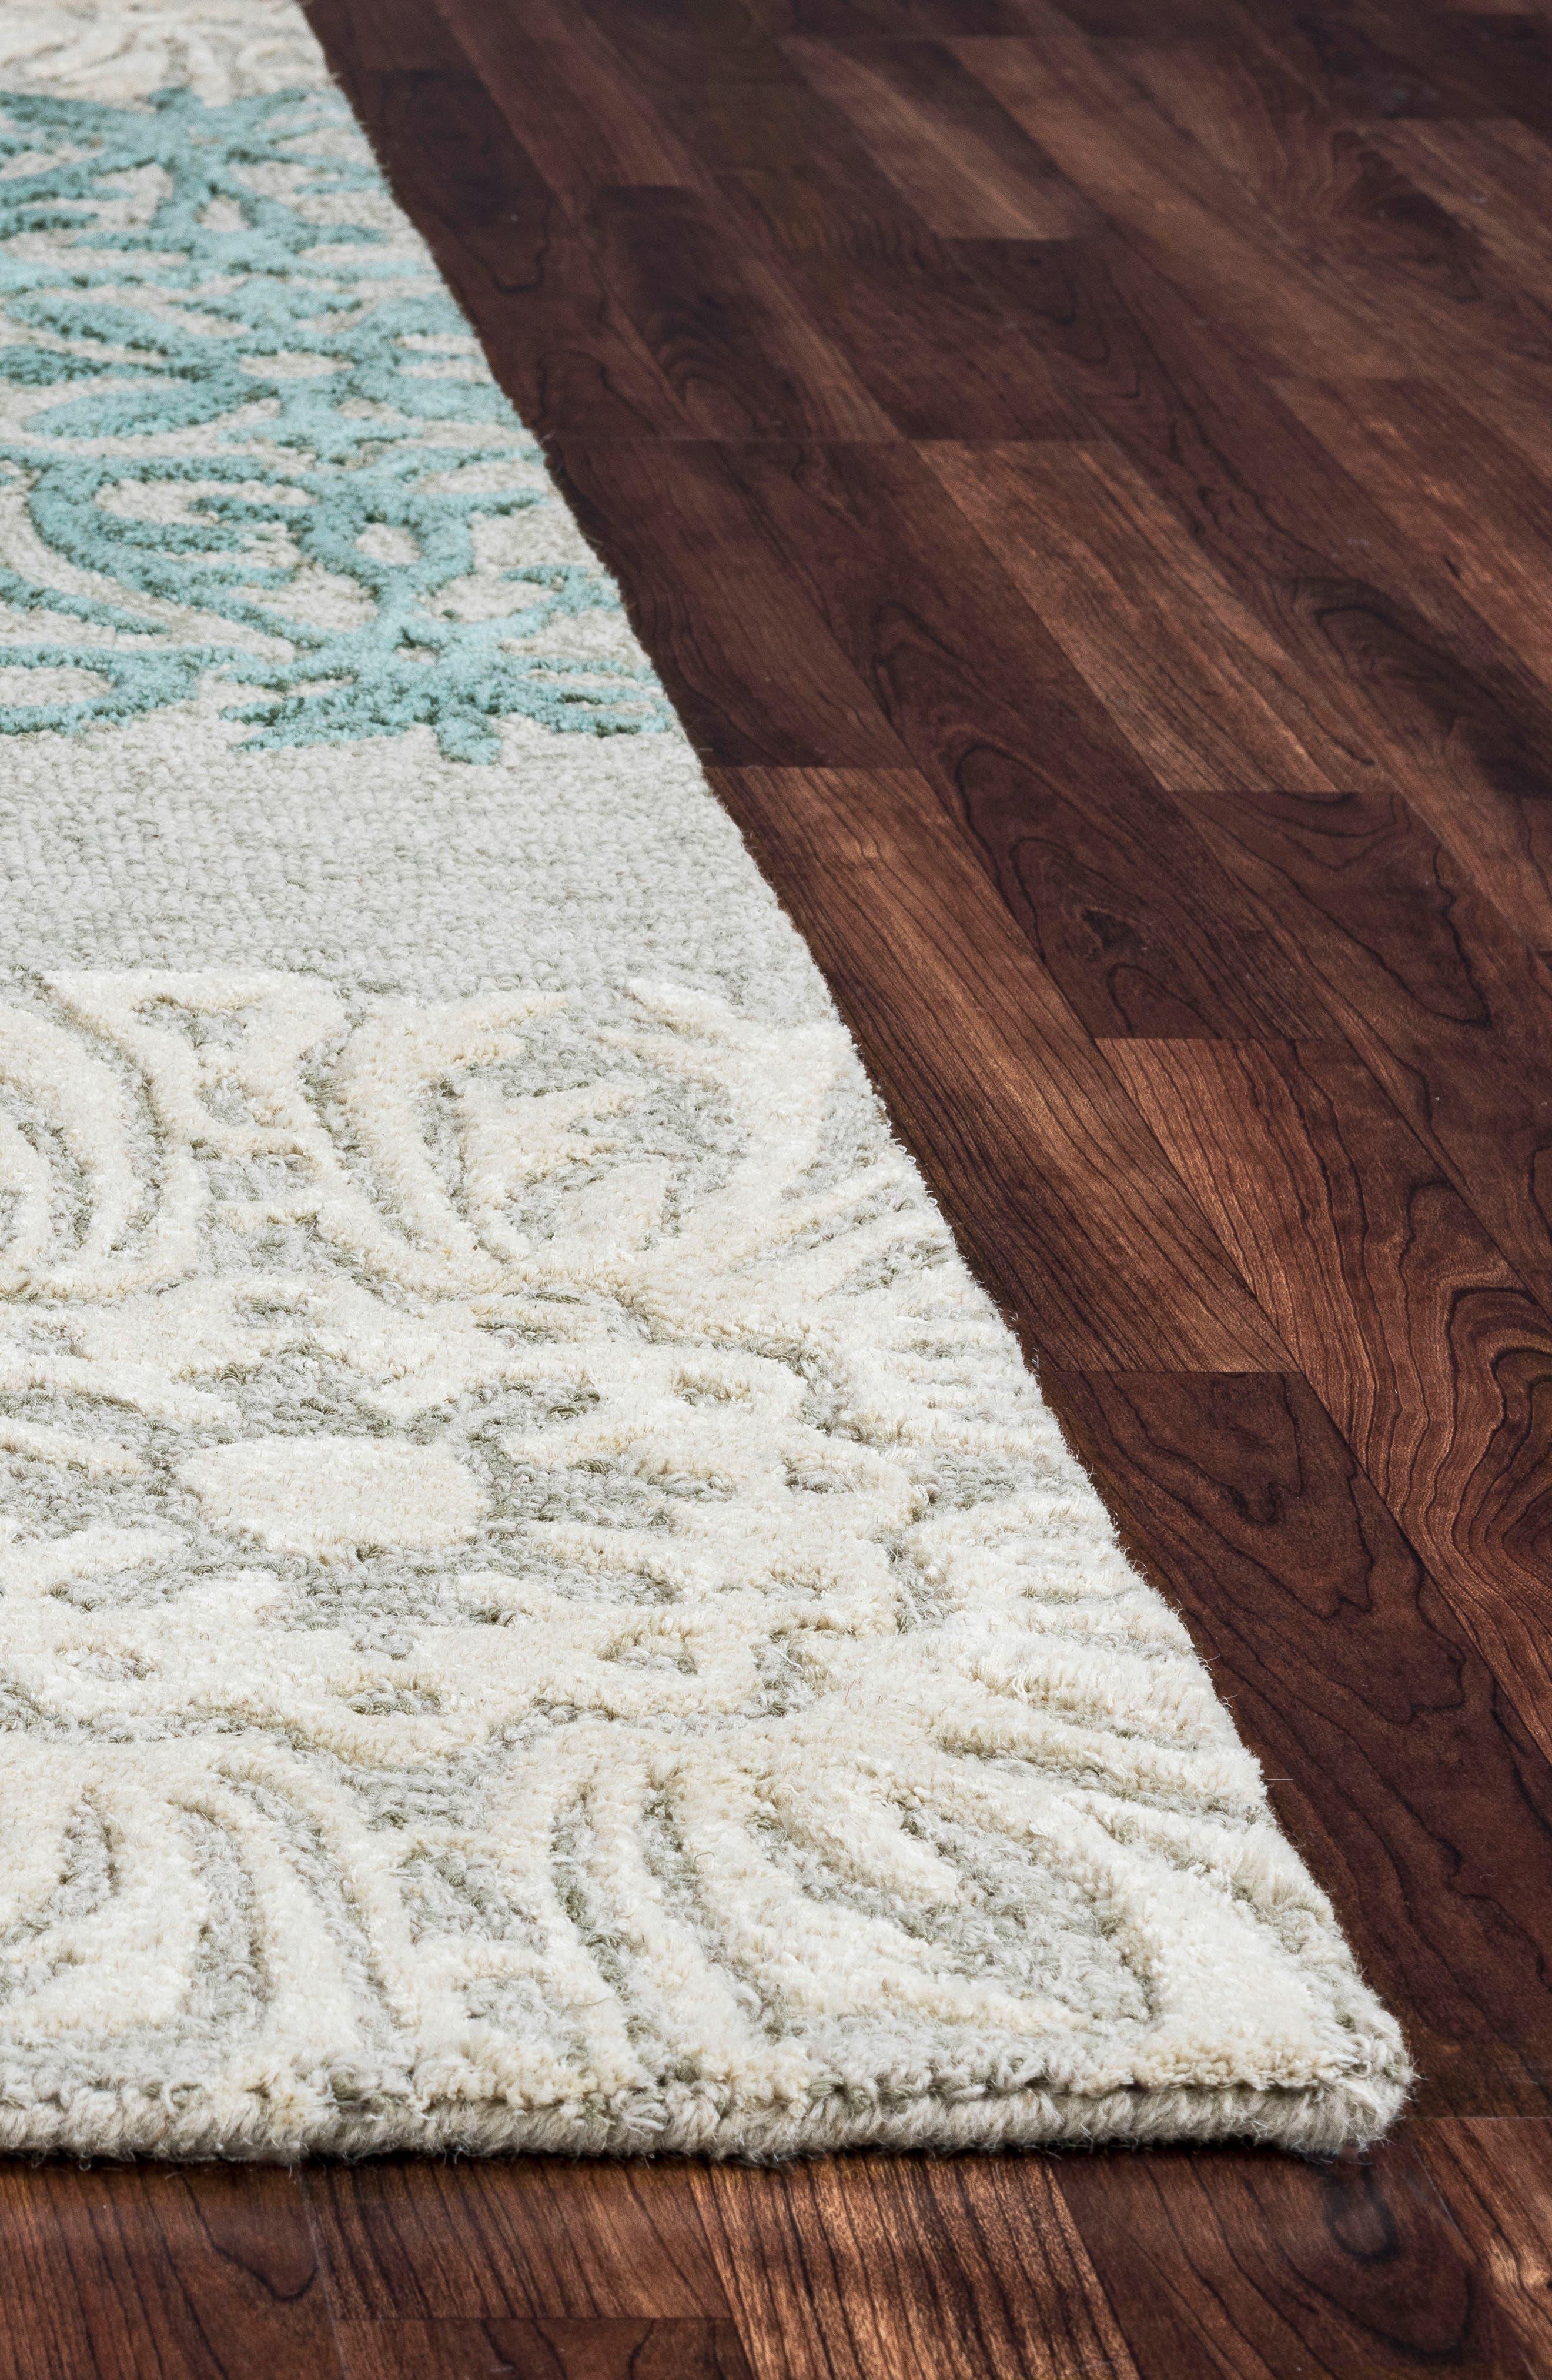 'Dimensional' Wool Area Rug,                             Alternate thumbnail 2, color,